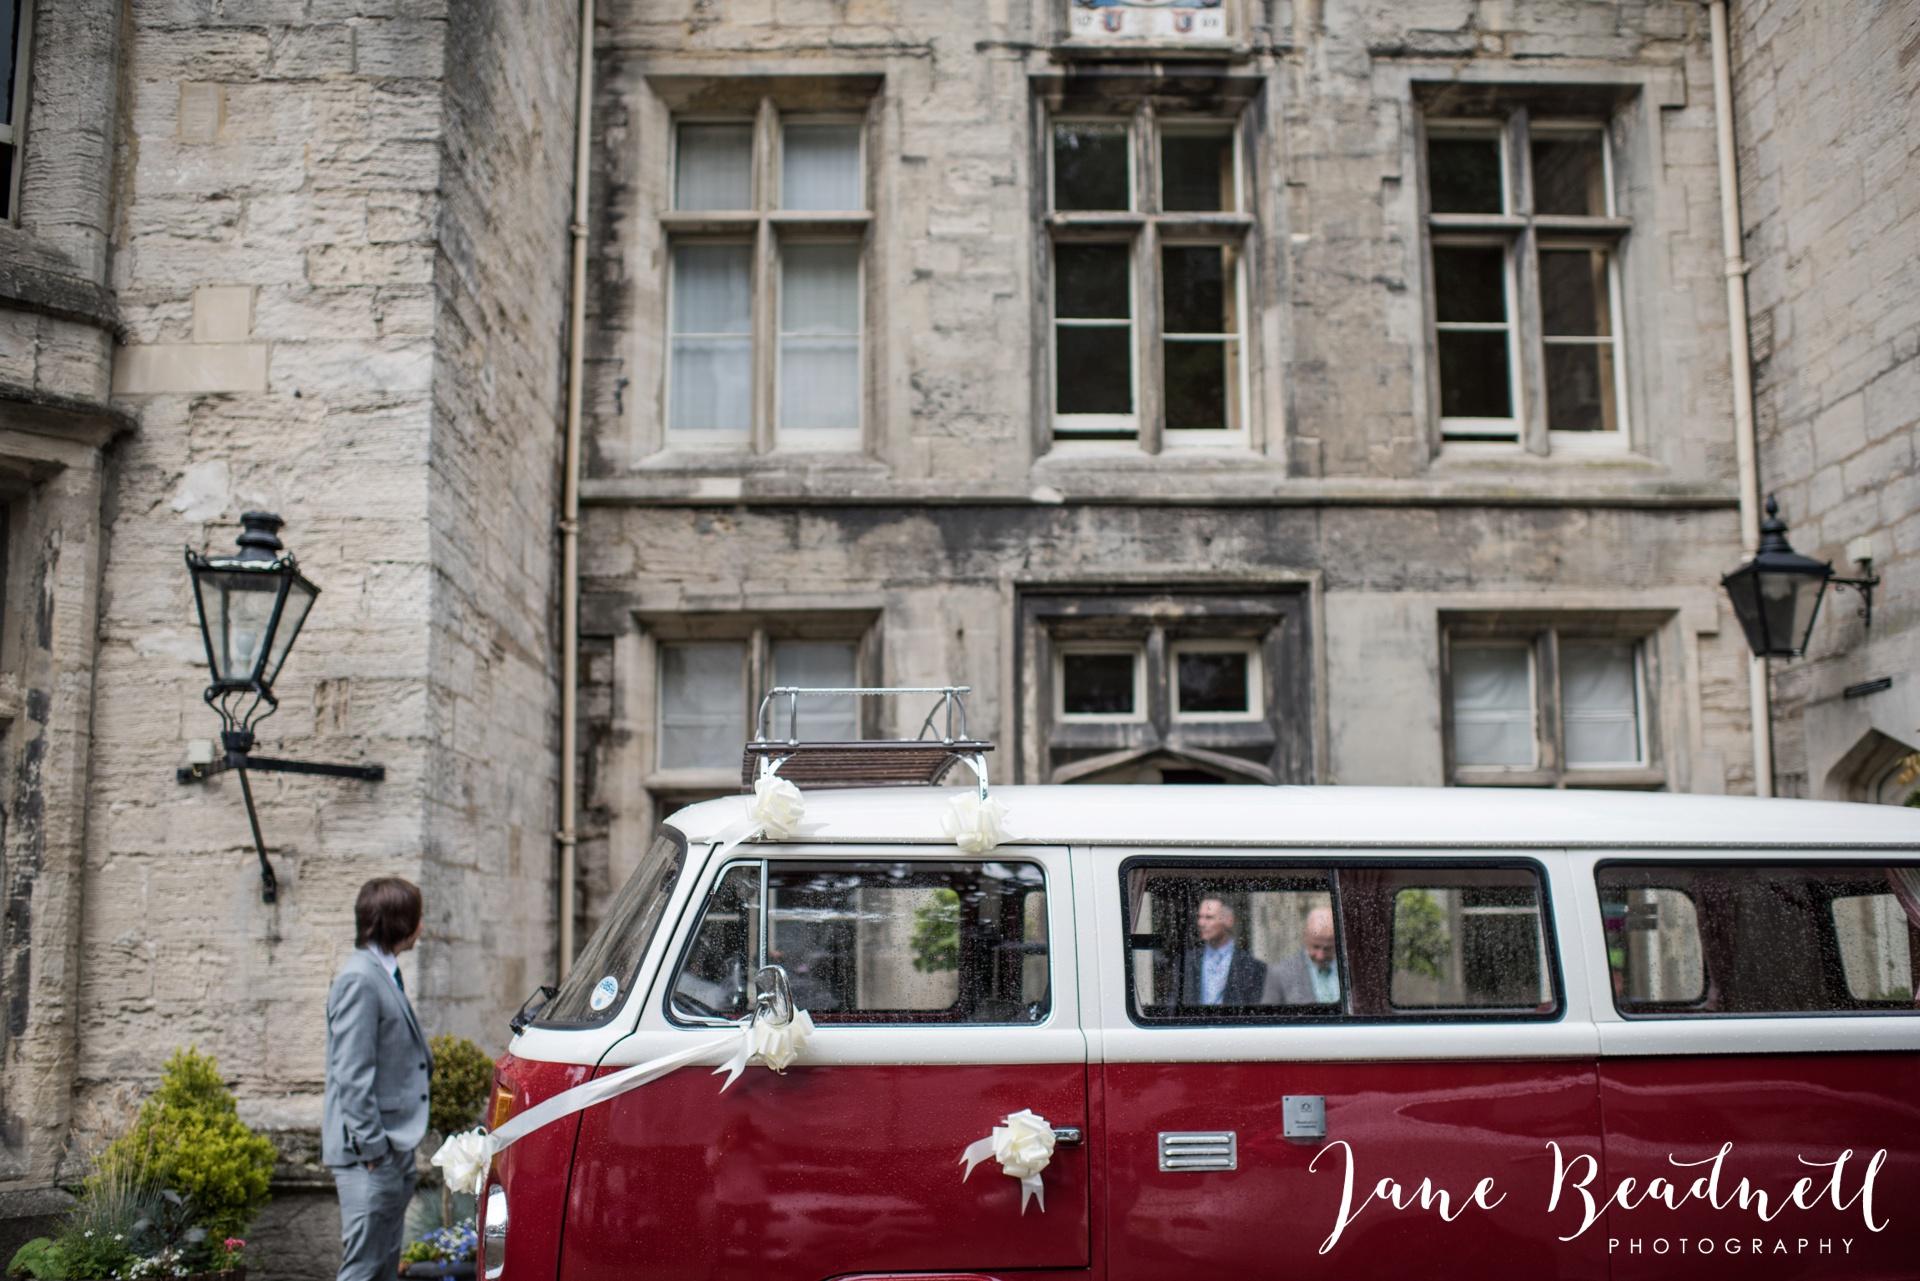 Jane Beadnell fine art wedding photographer The Old Deanery Ripon_0049